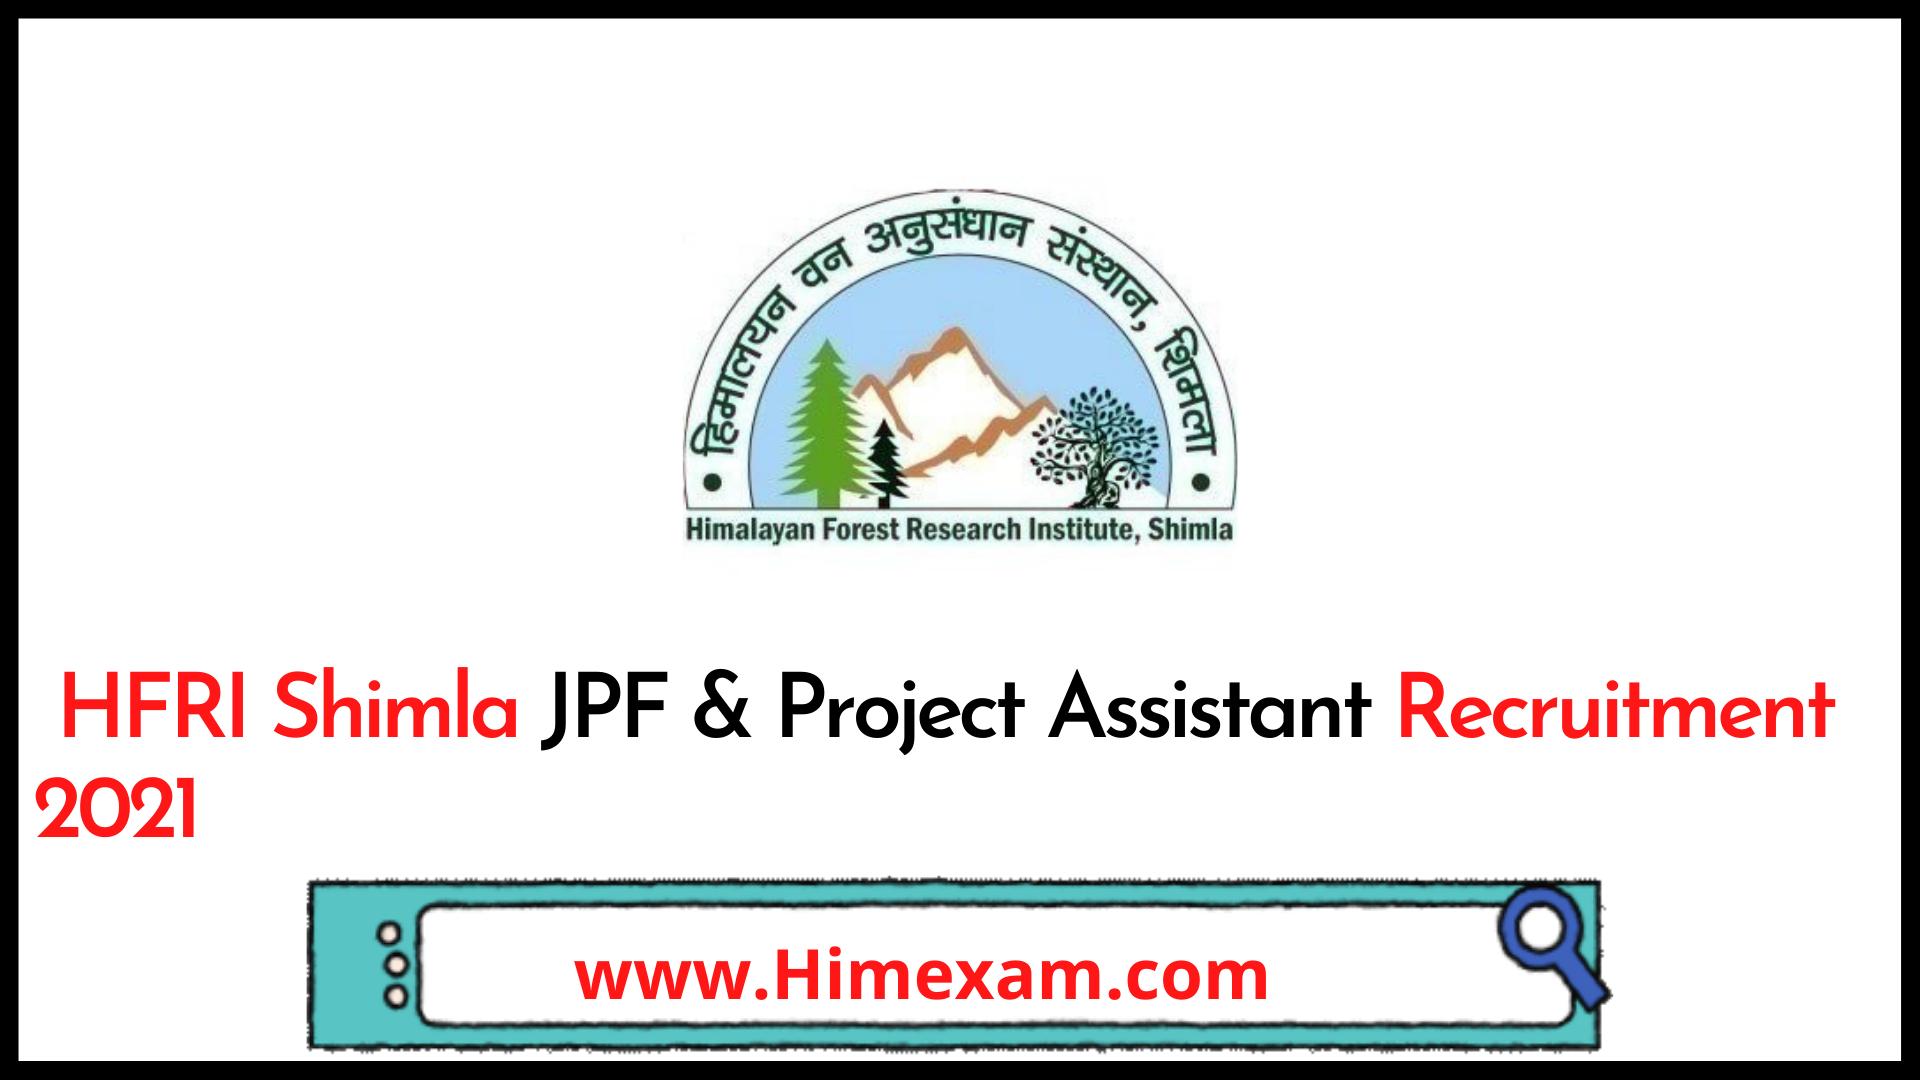 HFRI Shimla JPF & Project Assistant Recruitment 2021